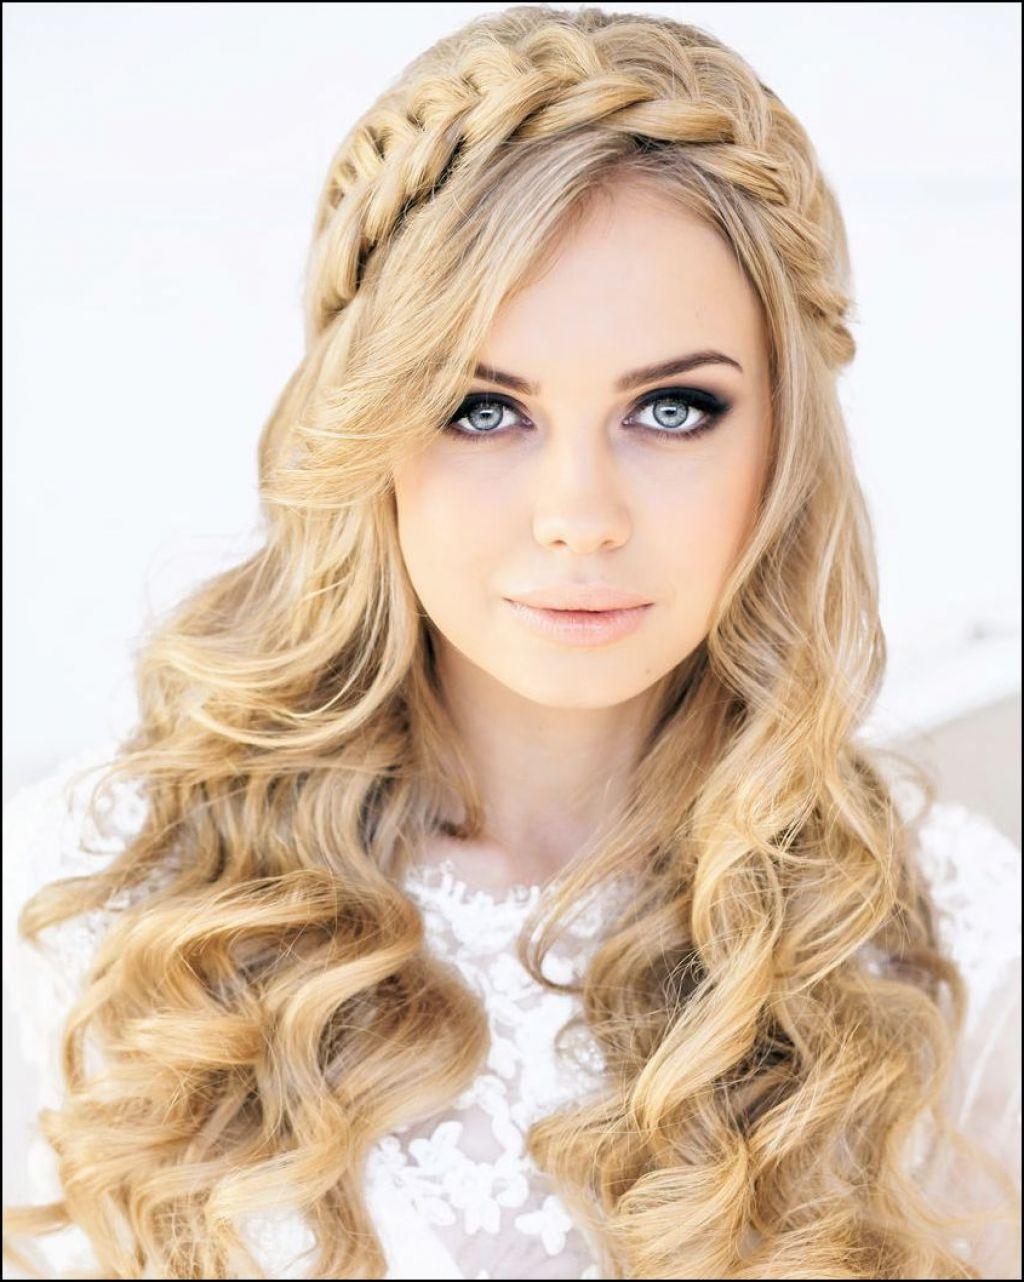 Langes Haar Frisuren  Bandana Frisuren für langes Haar Trend Frisuren Stil